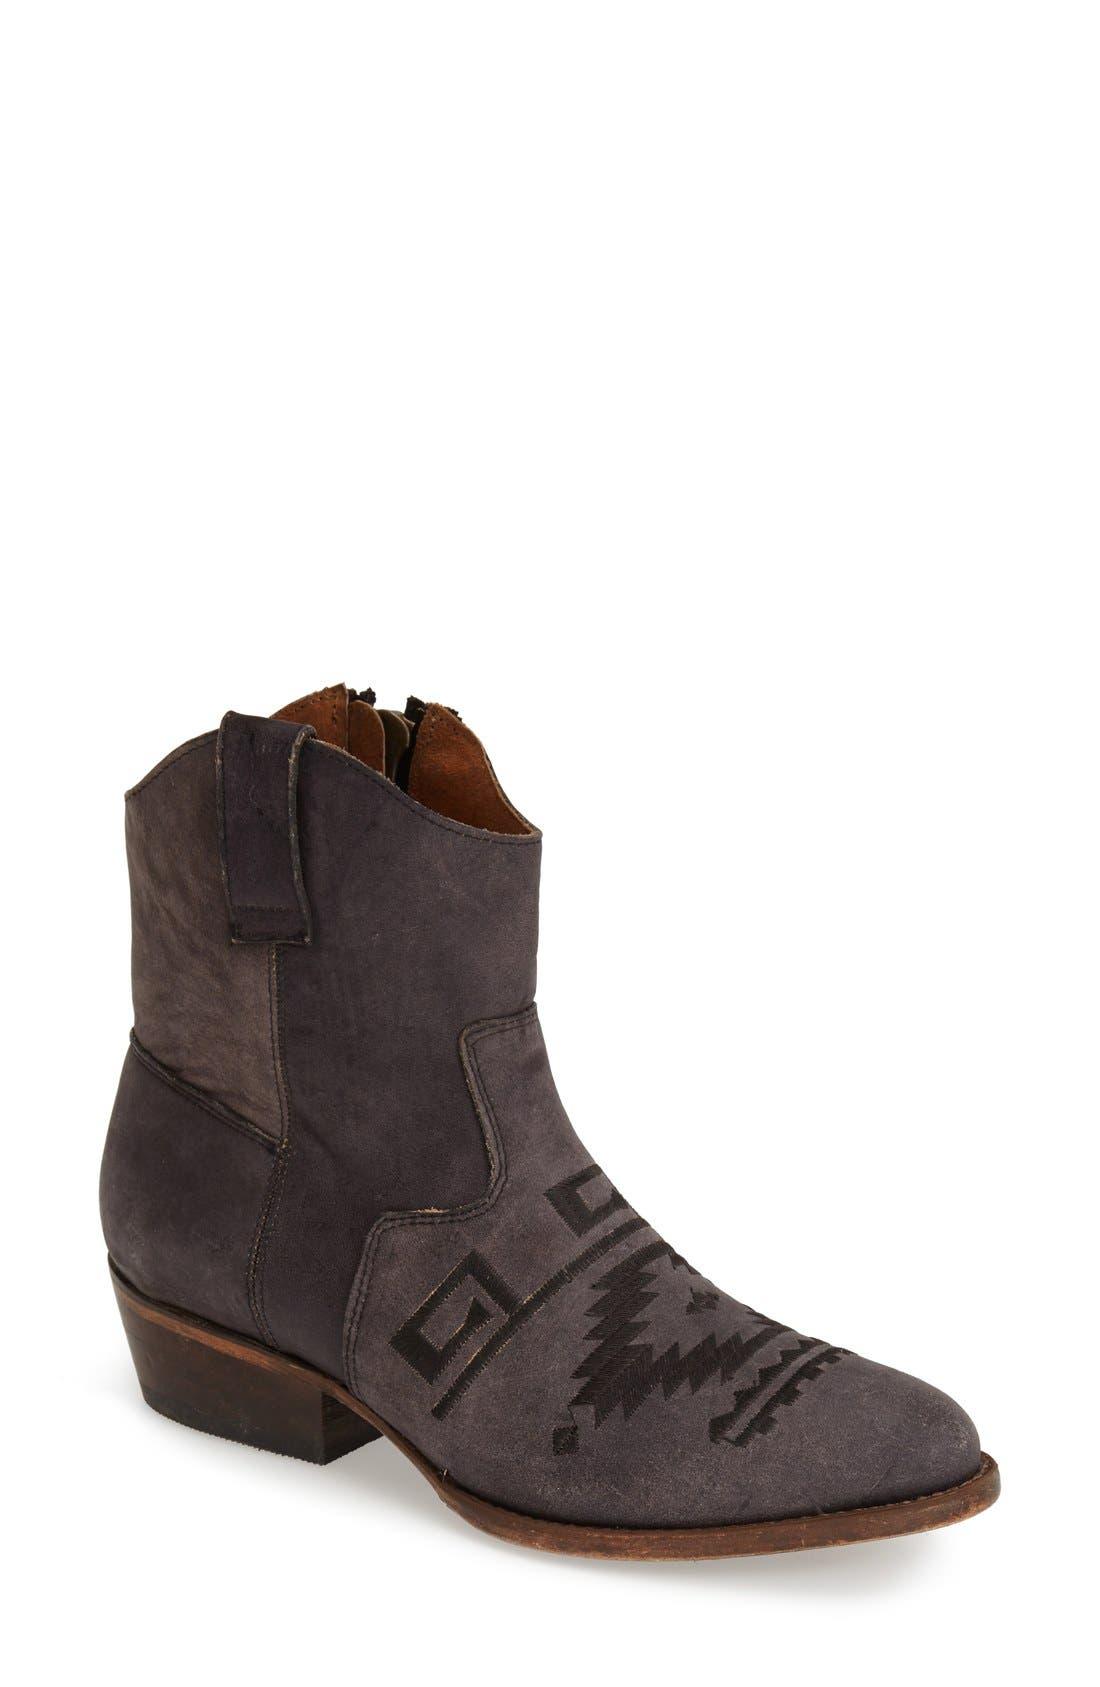 Alternate Image 1 Selected - Matisse 'Remington' Western Boot (Women)